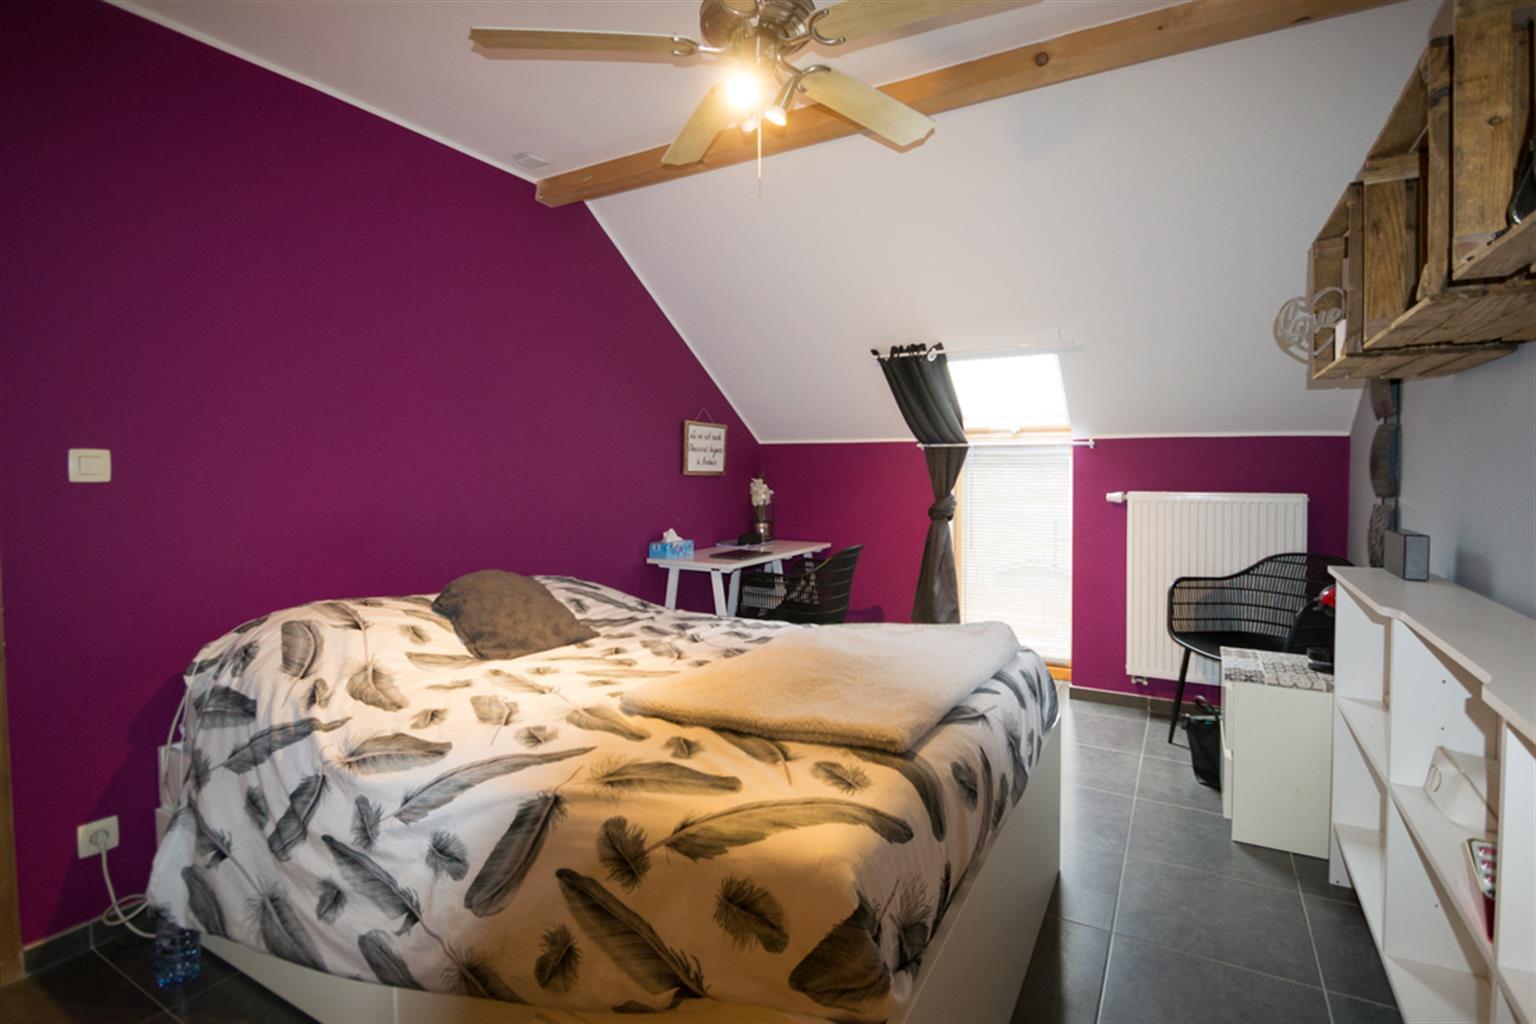 Duplex - Le Roeulx  - #4335104-6